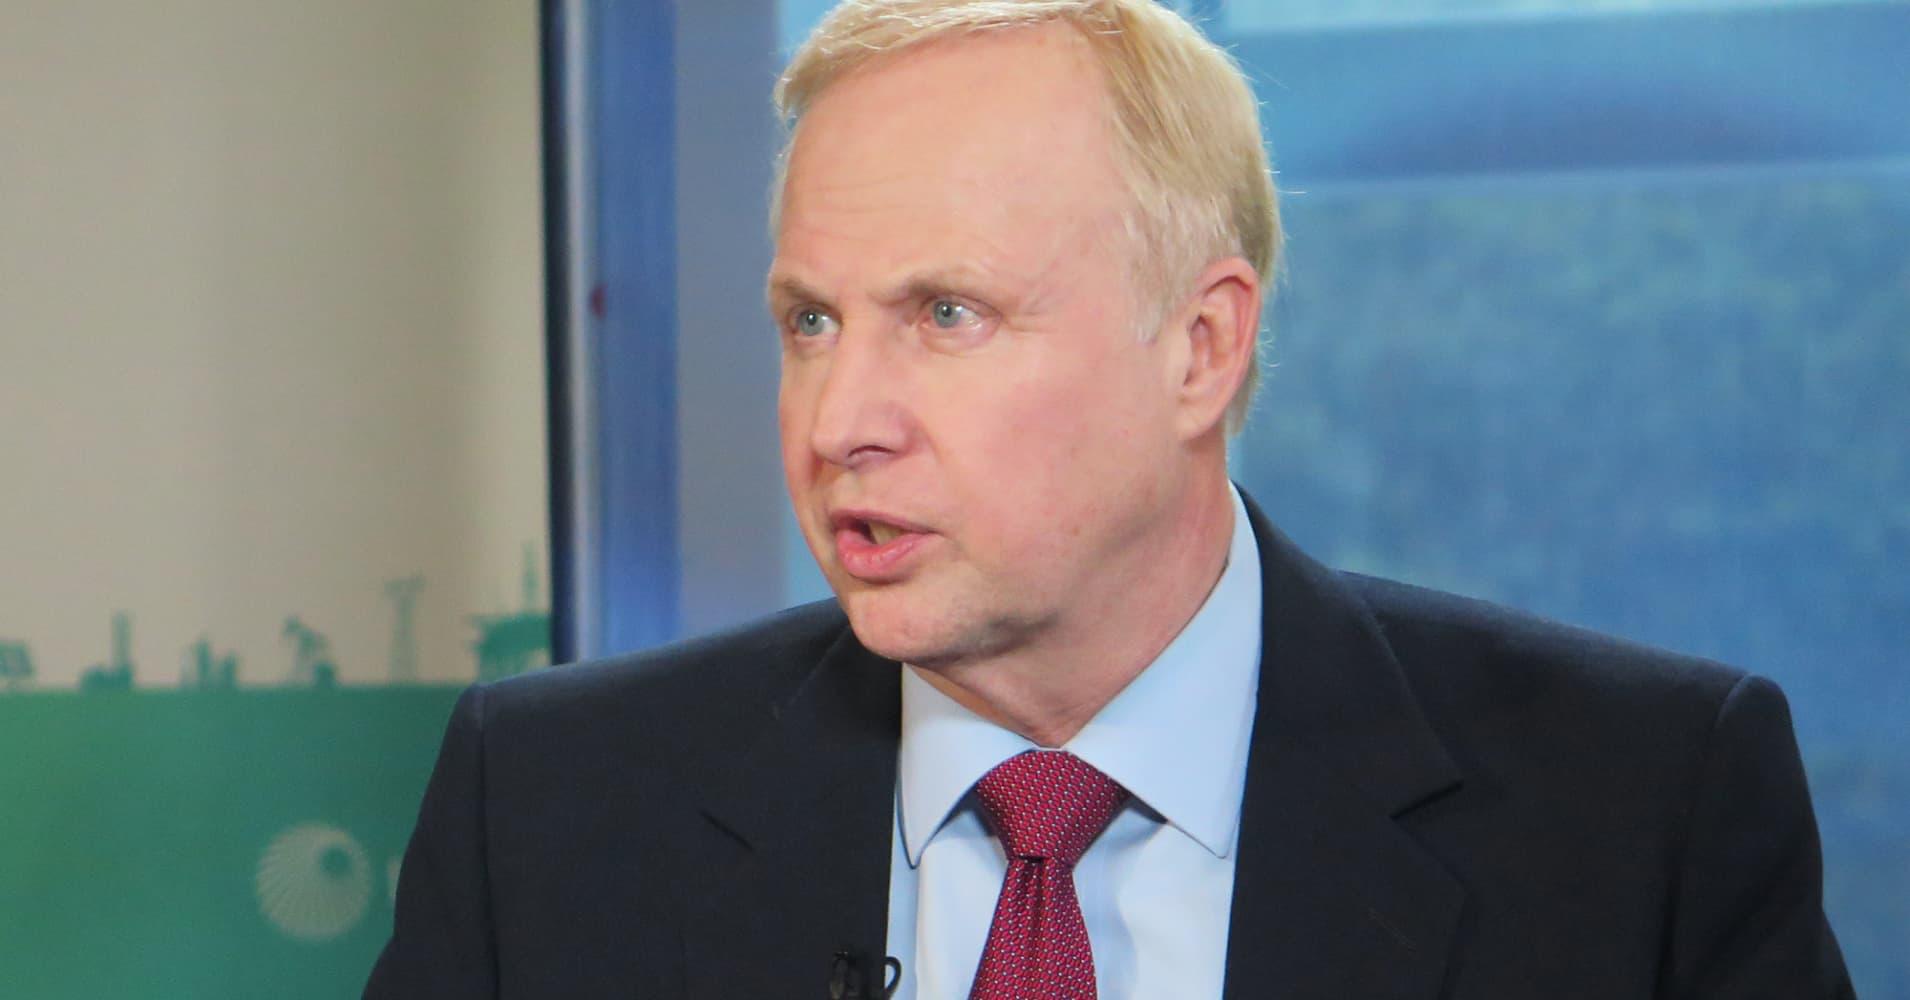 BP CEO Bob Dudley says oil prices will range between $50-$65 'fairway'